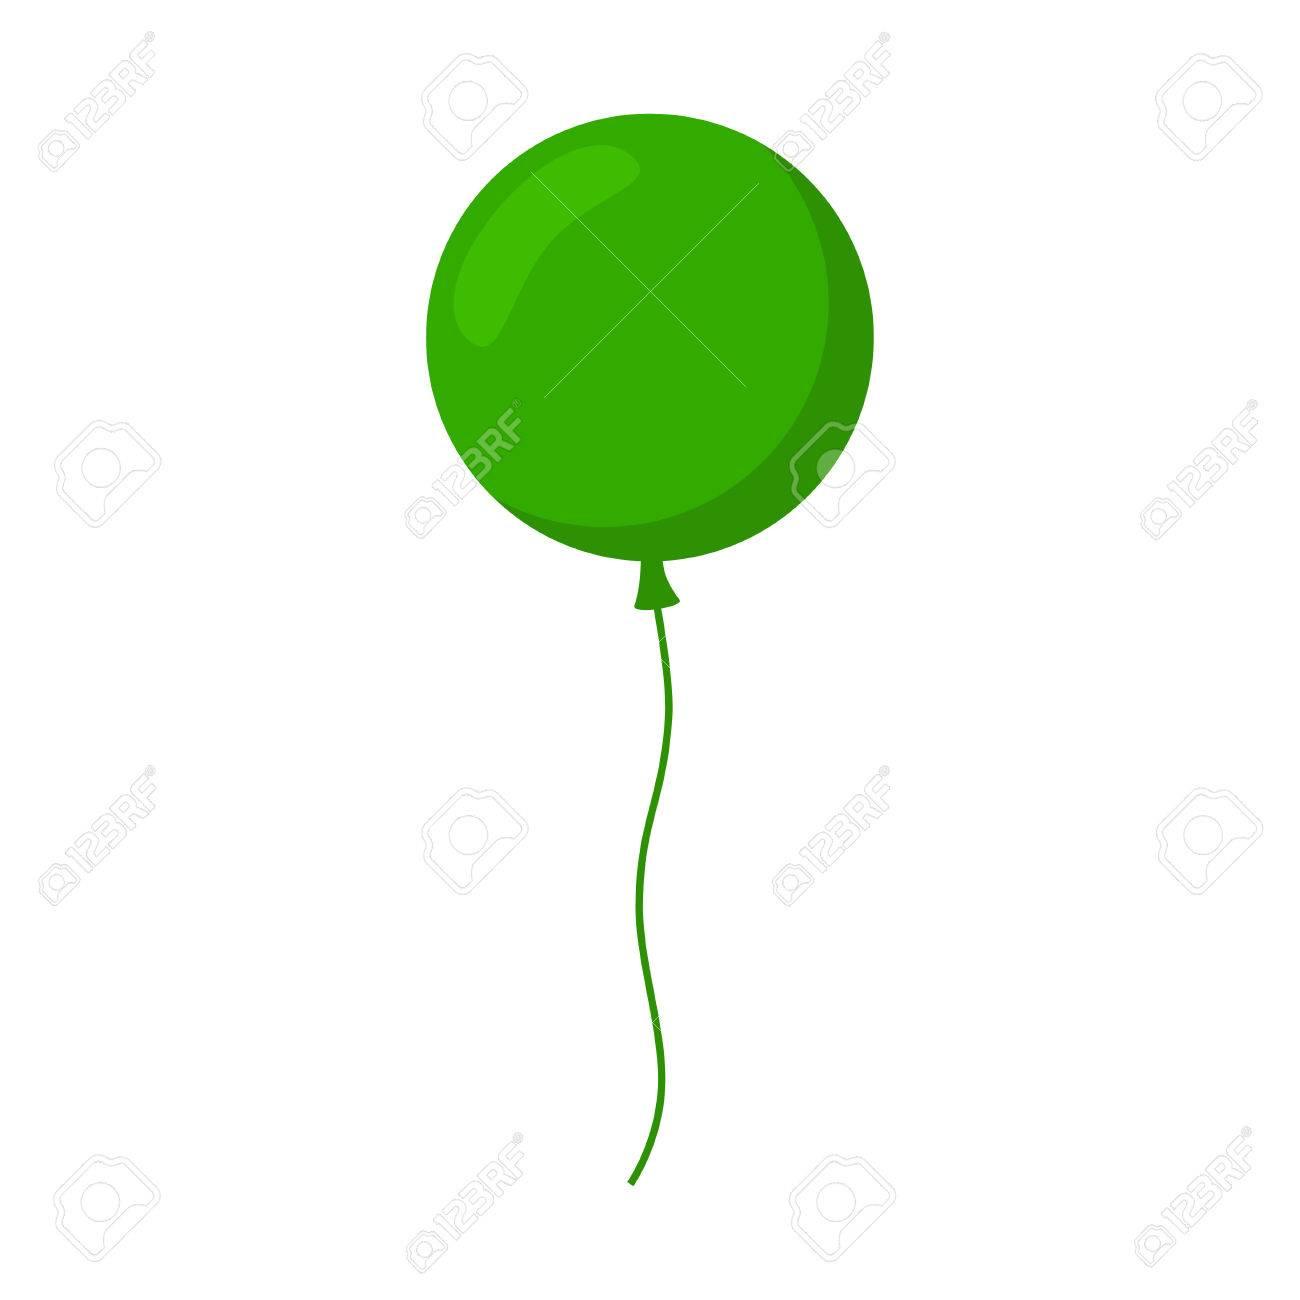 Ballon Geïsoleerd Pictogram Kleurrijke Ballon Groene Ballon Grote